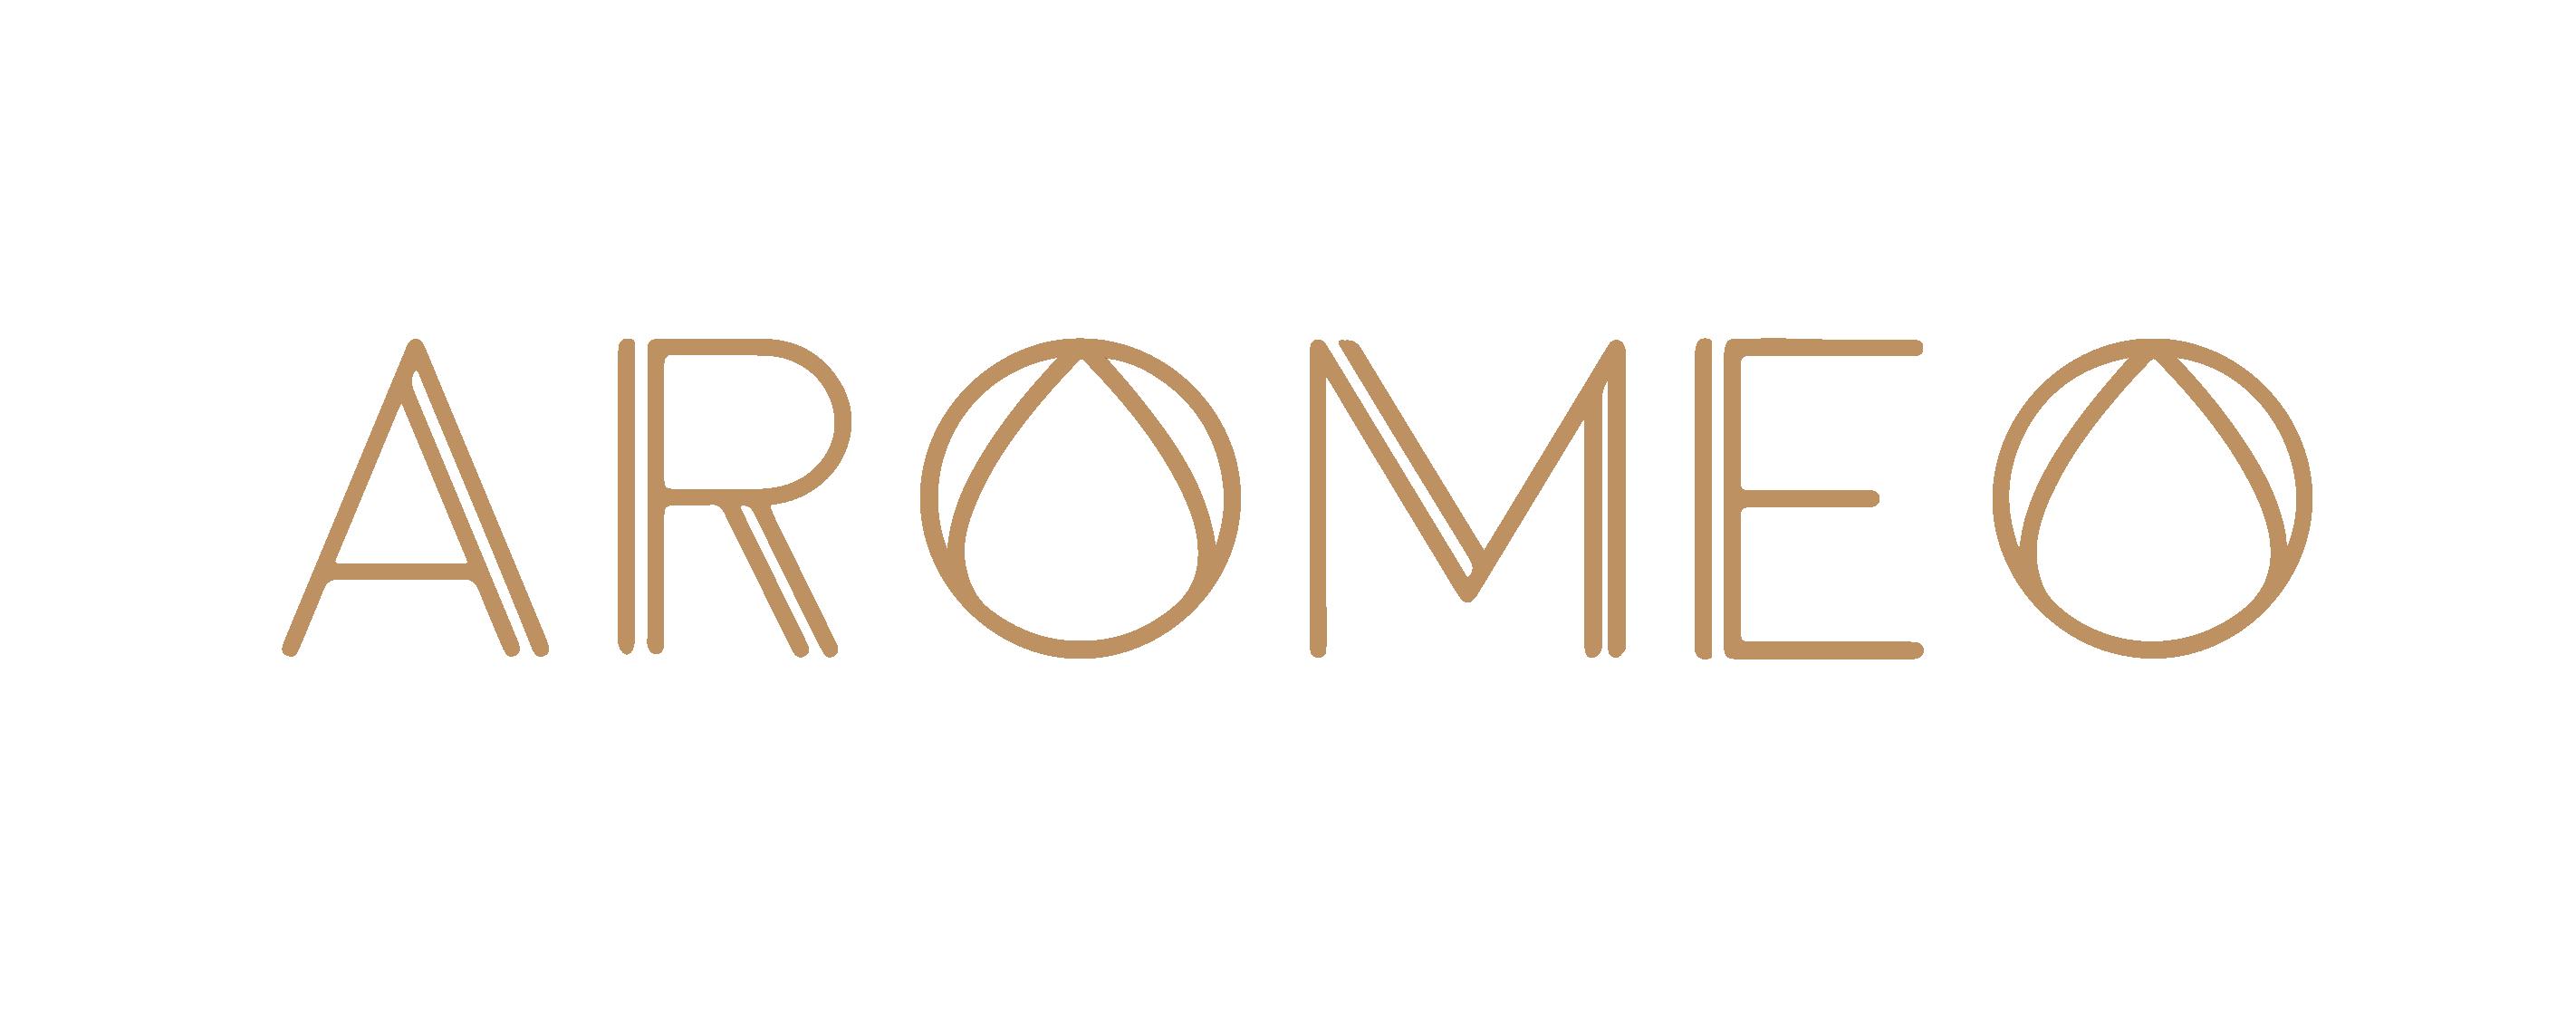 Aromeo